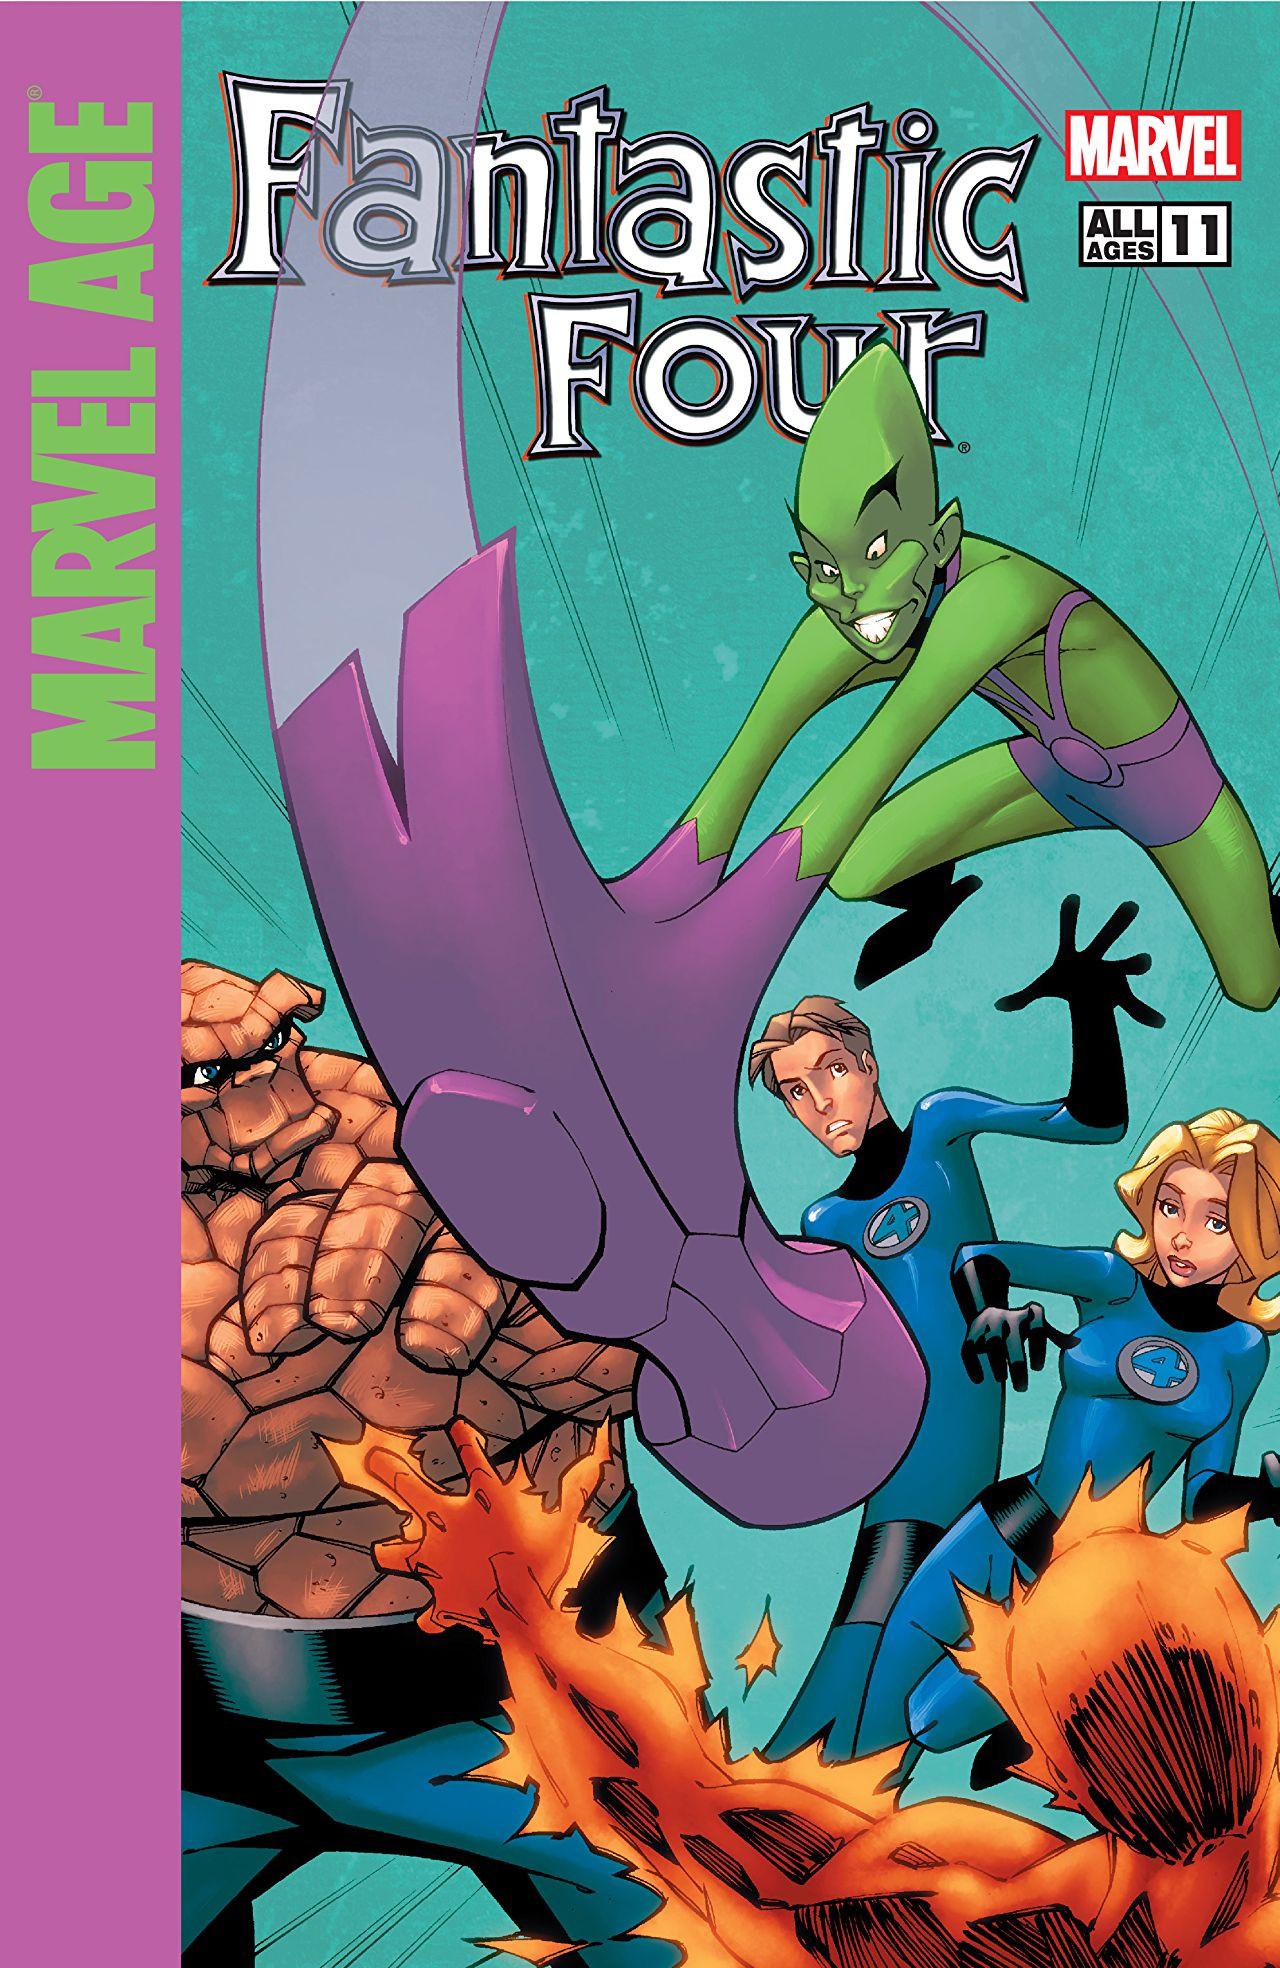 Marvel Age: Fantastic Four Vol 1 11